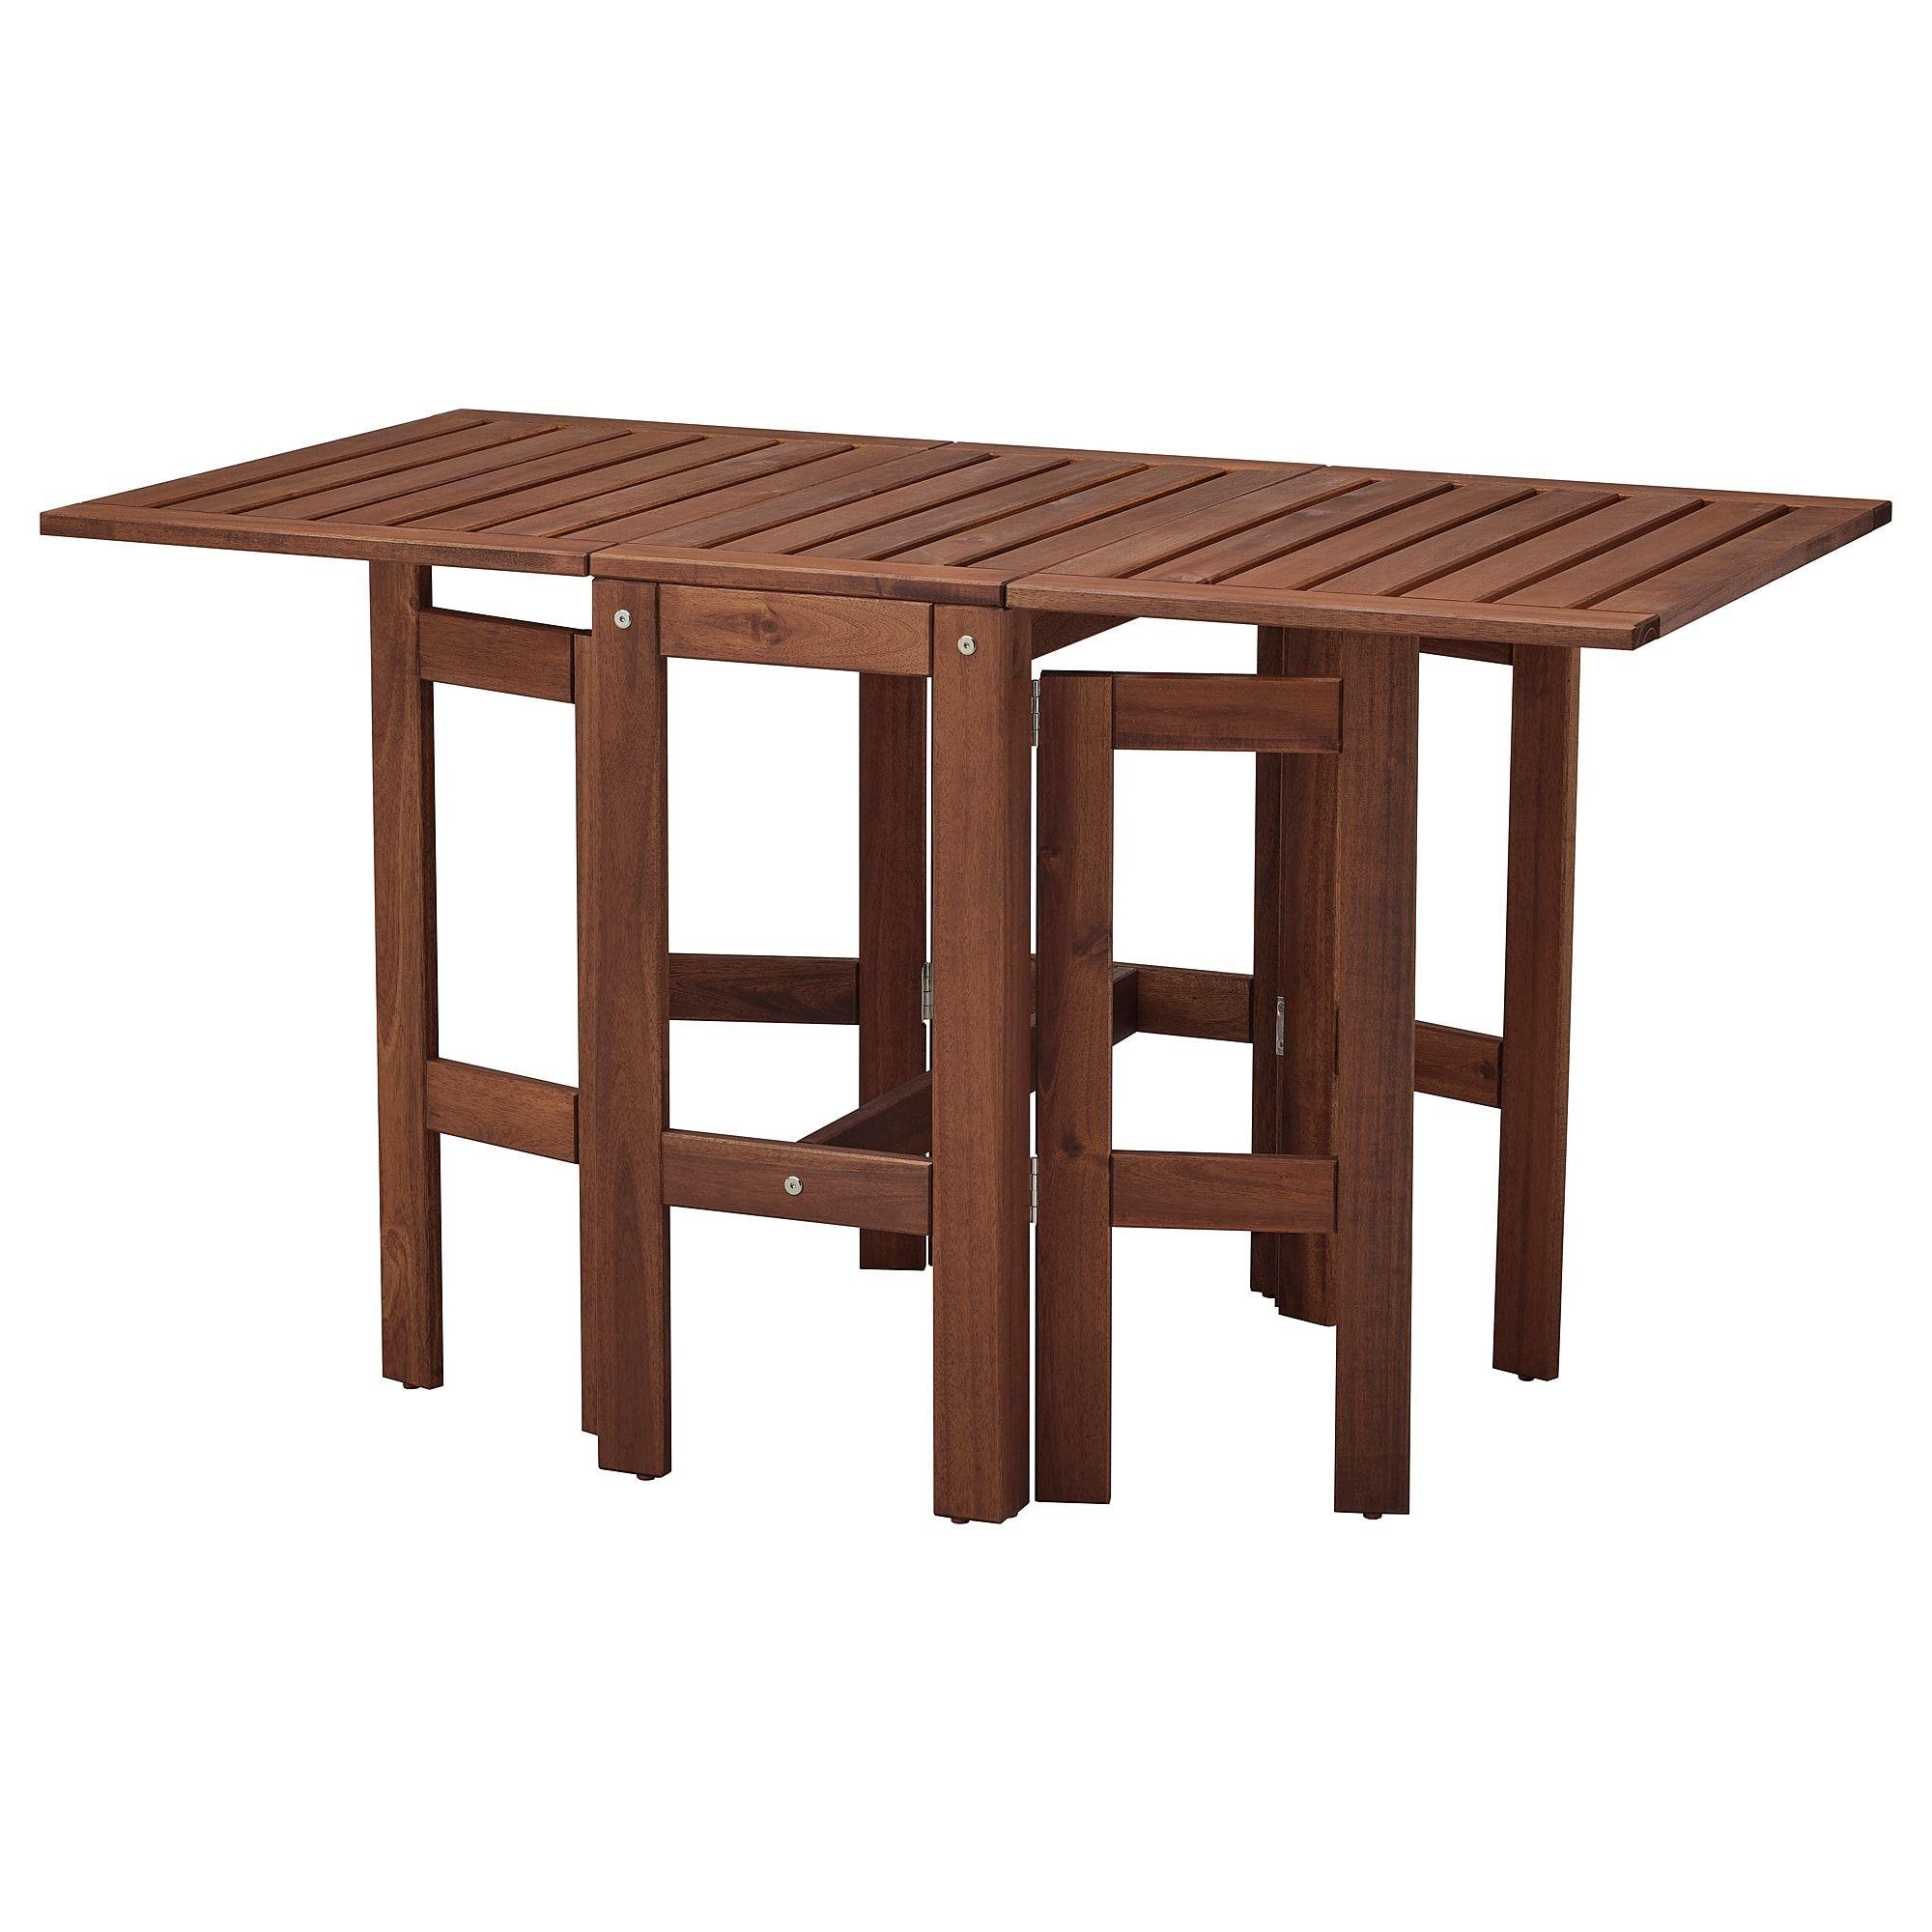 Applaro Mesa Abas Rbtv Pern Articul Ext Velatura Castanha Ikea In 2020 Outdoor Dining Furniture Wooden Outdoor Furniture Ikea